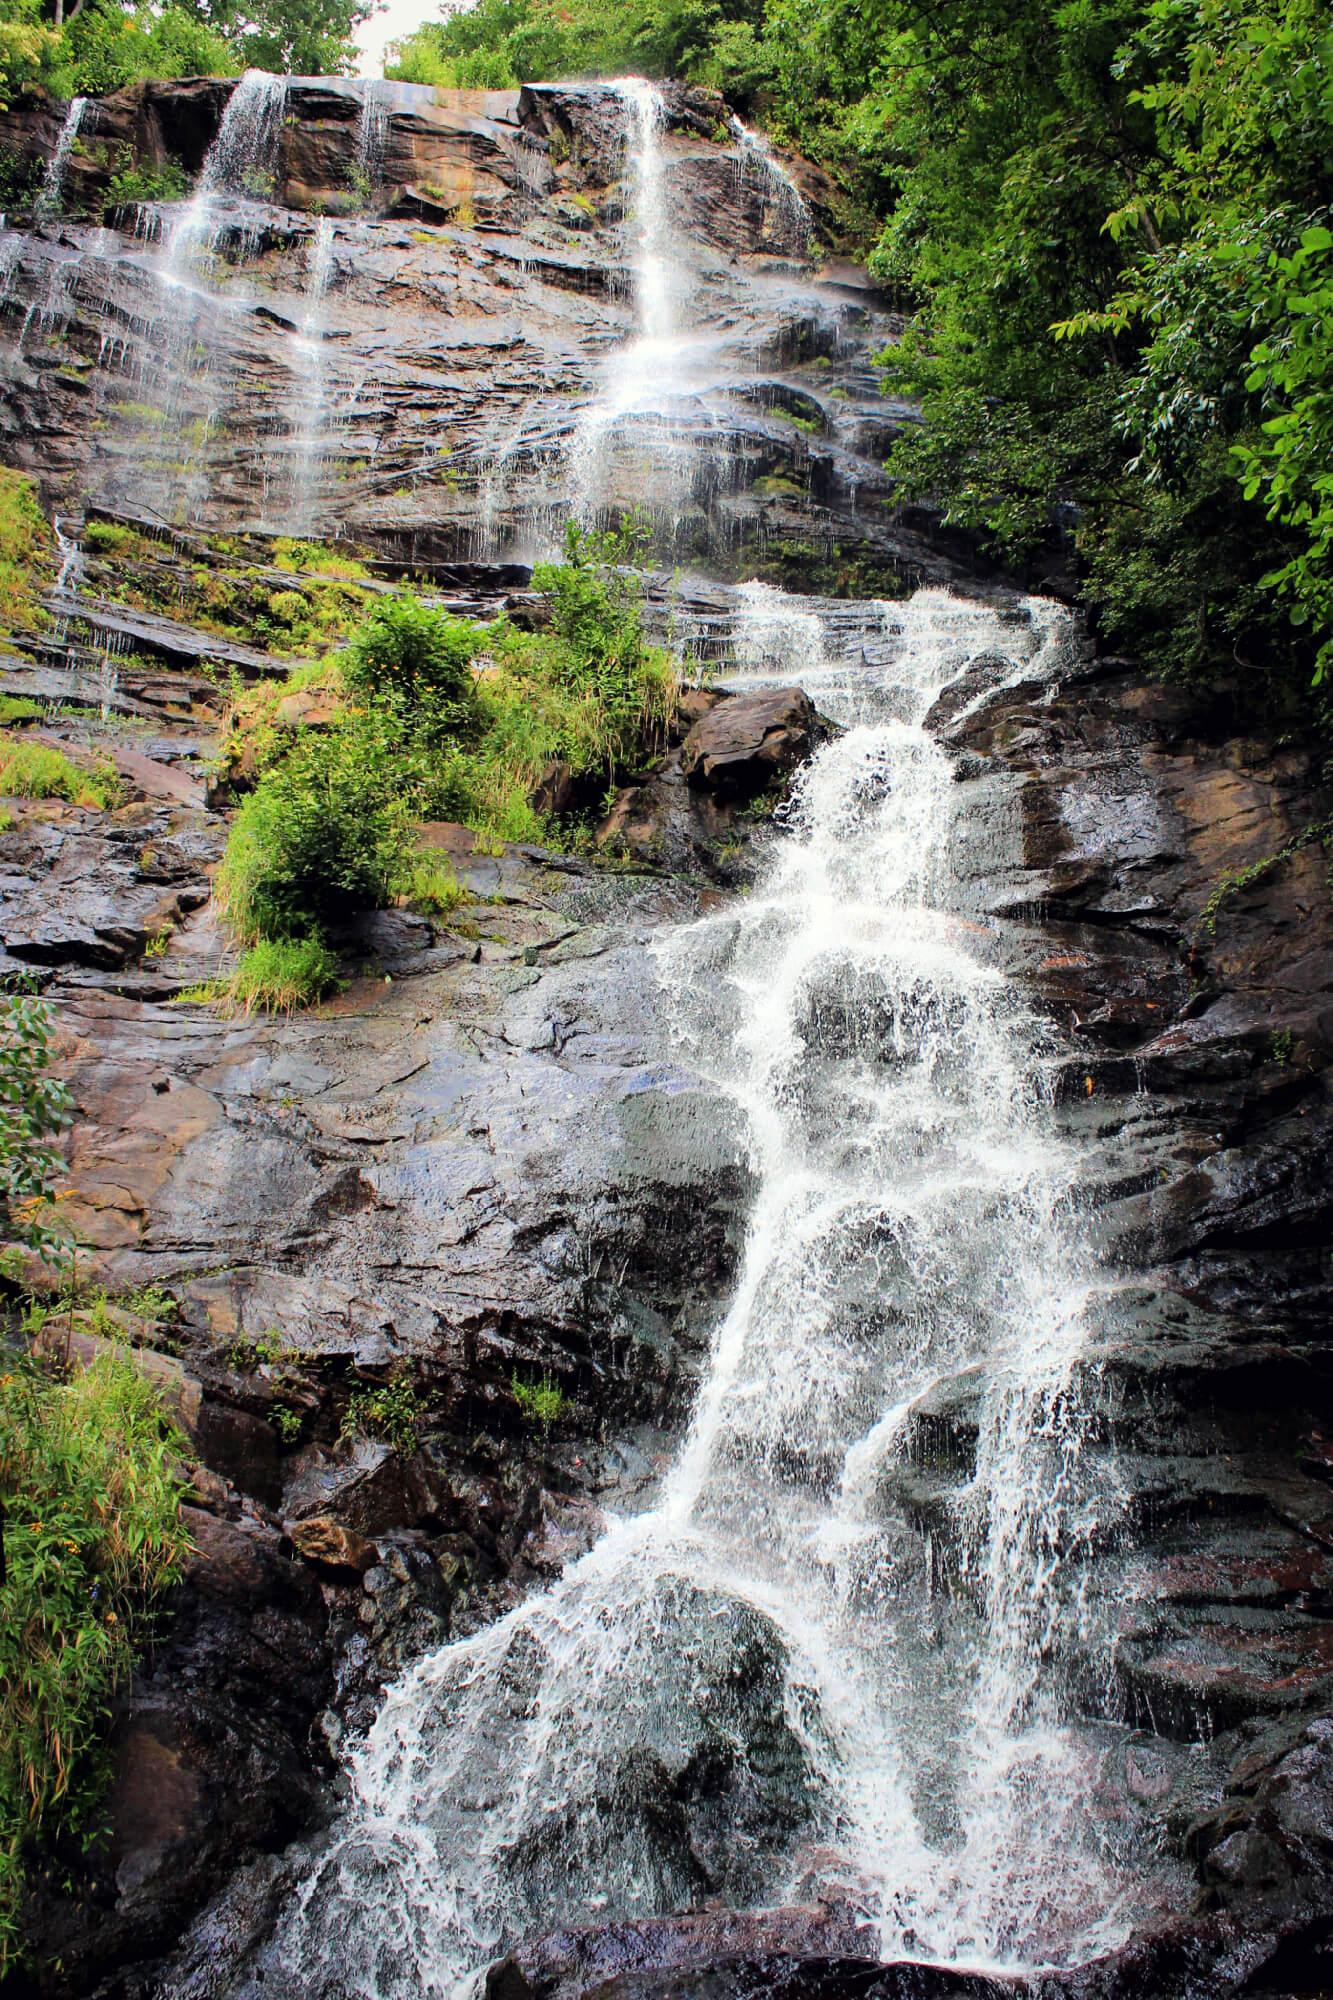 Amicalola Falls, the highest waterfall in Georgia